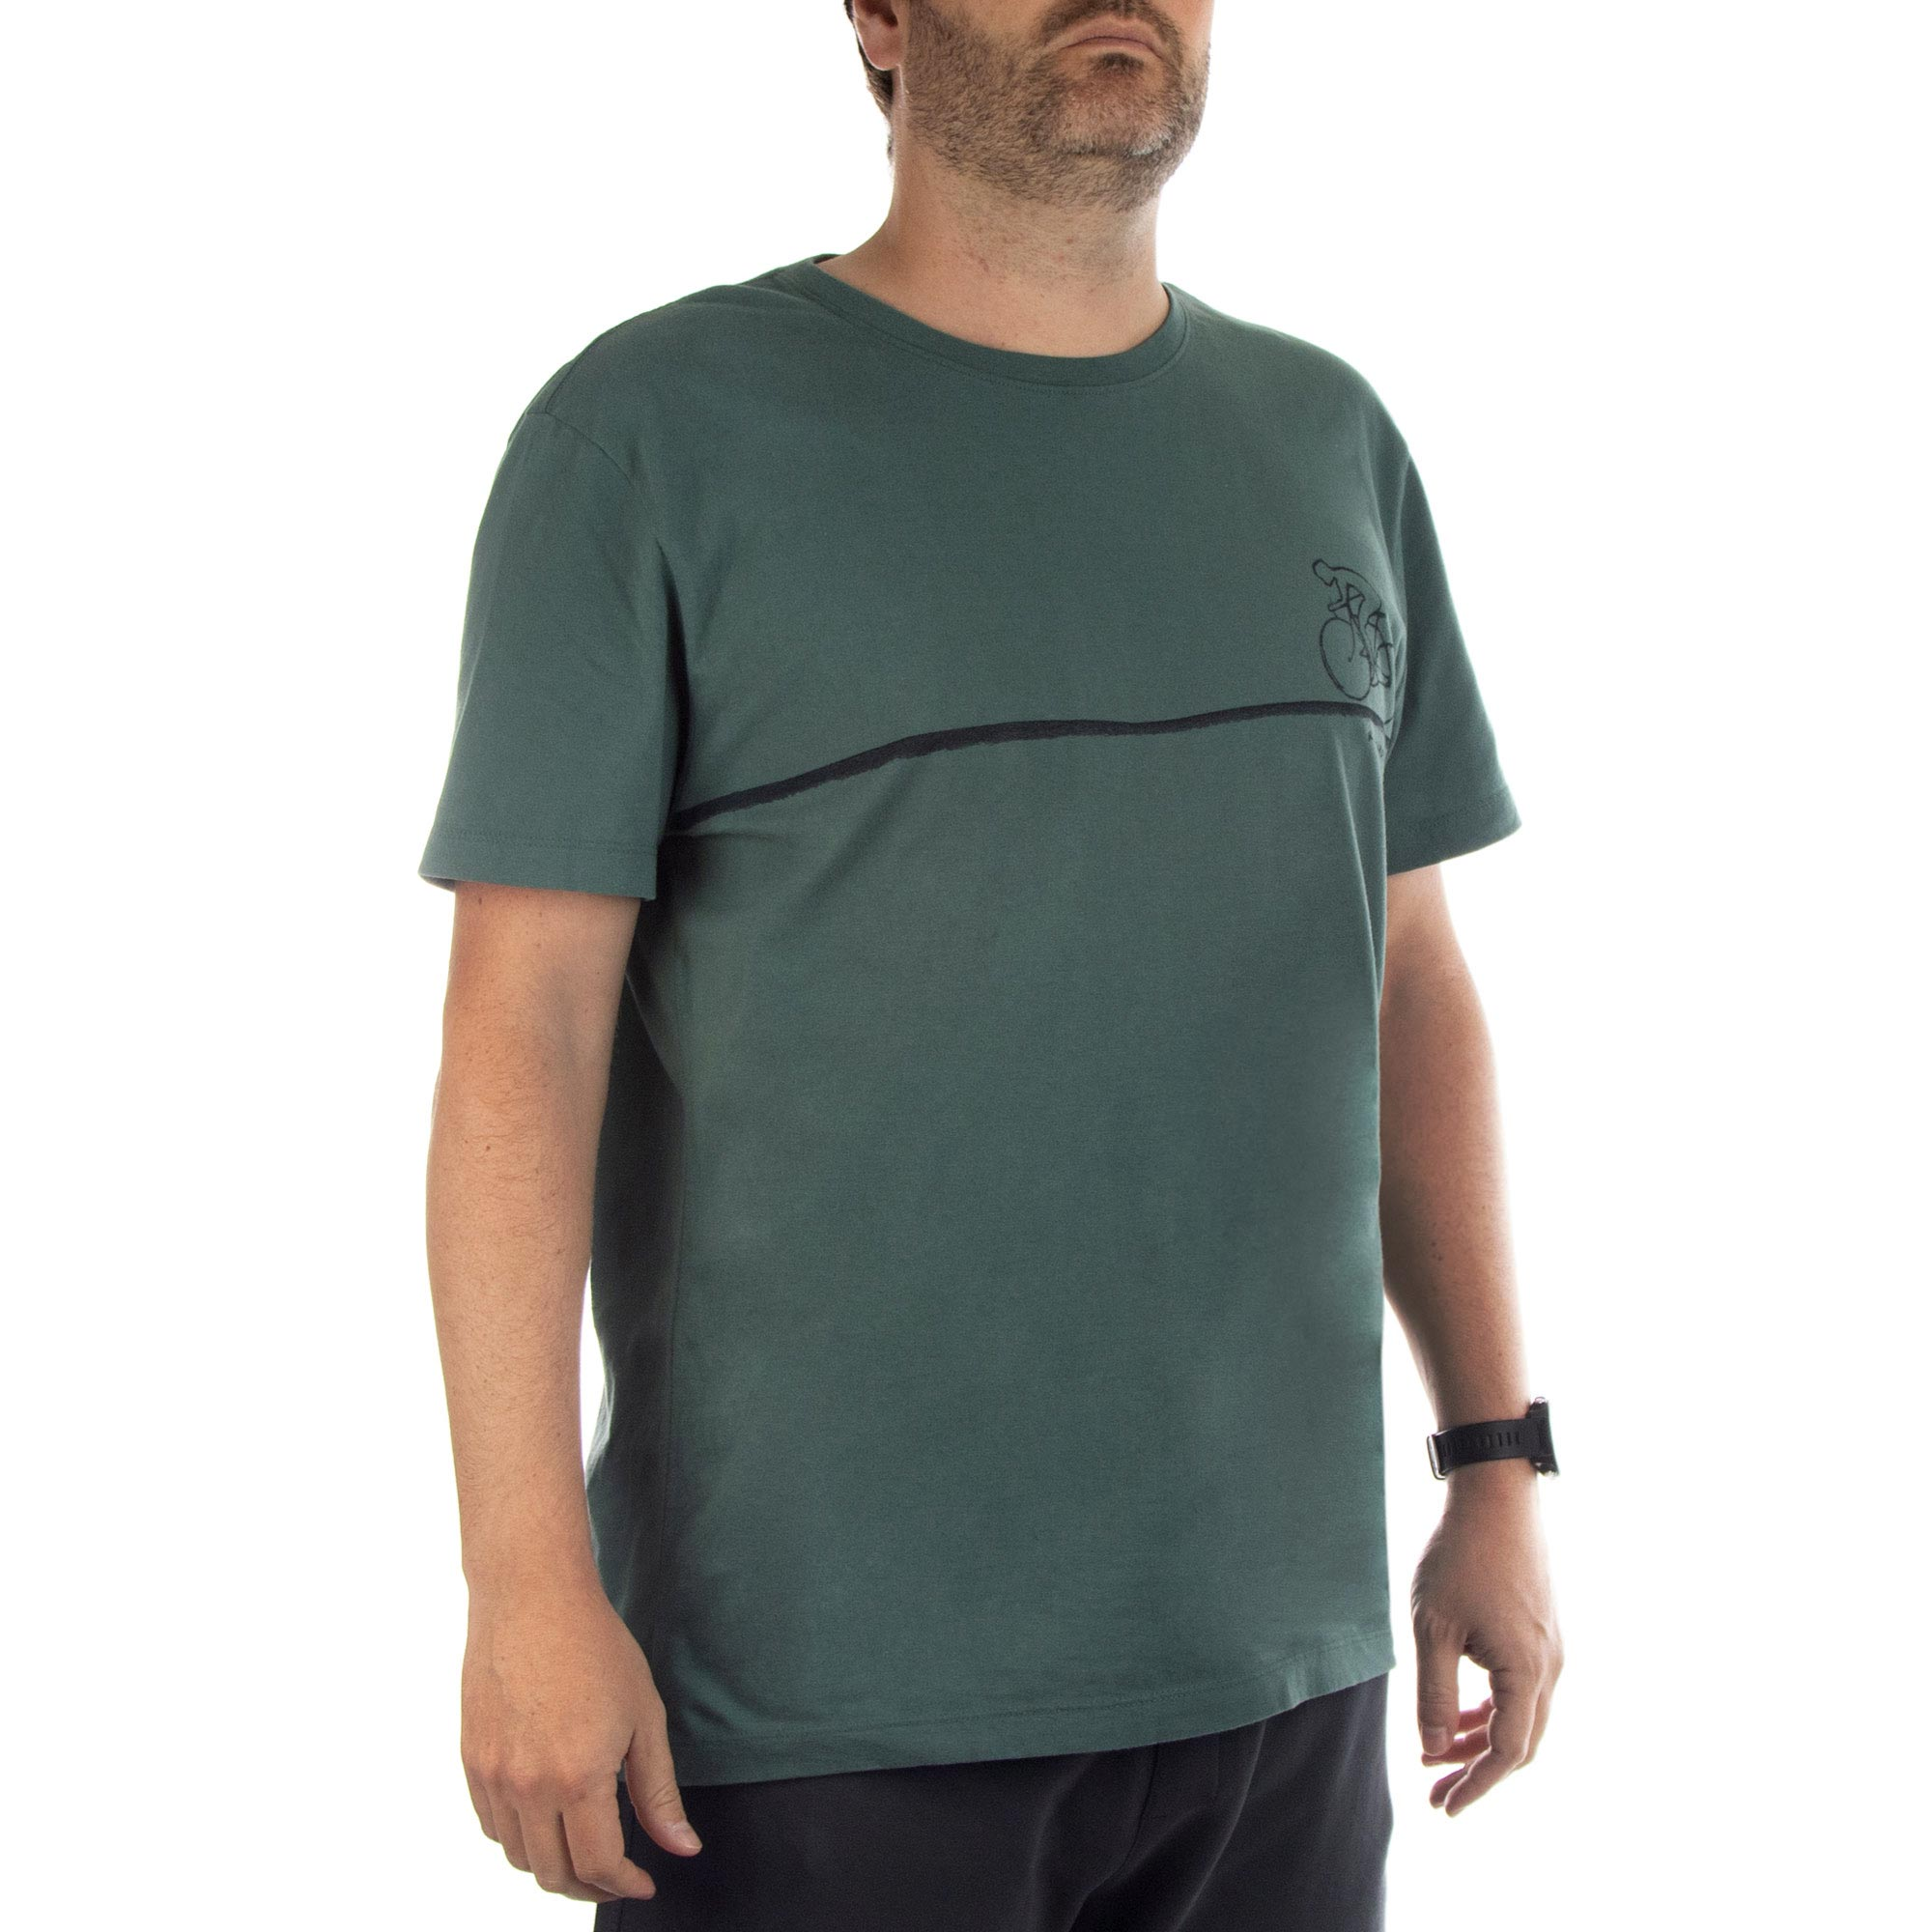 Richards Camiseta Malha Reativo Manga Curta Masculino Verde